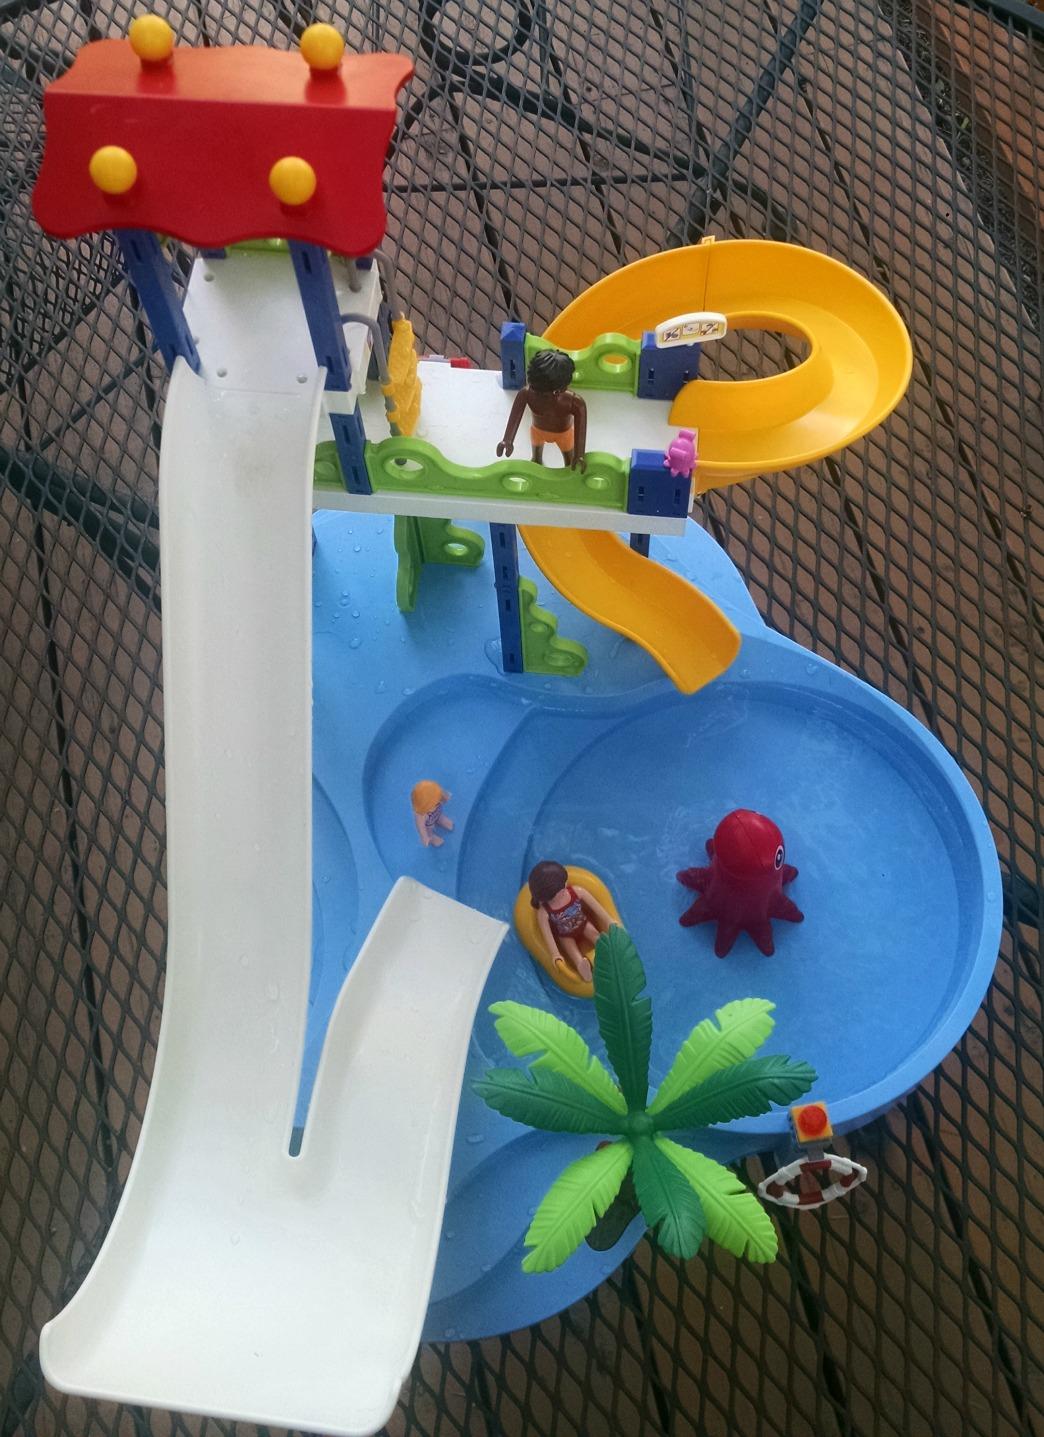 playmobil-slide